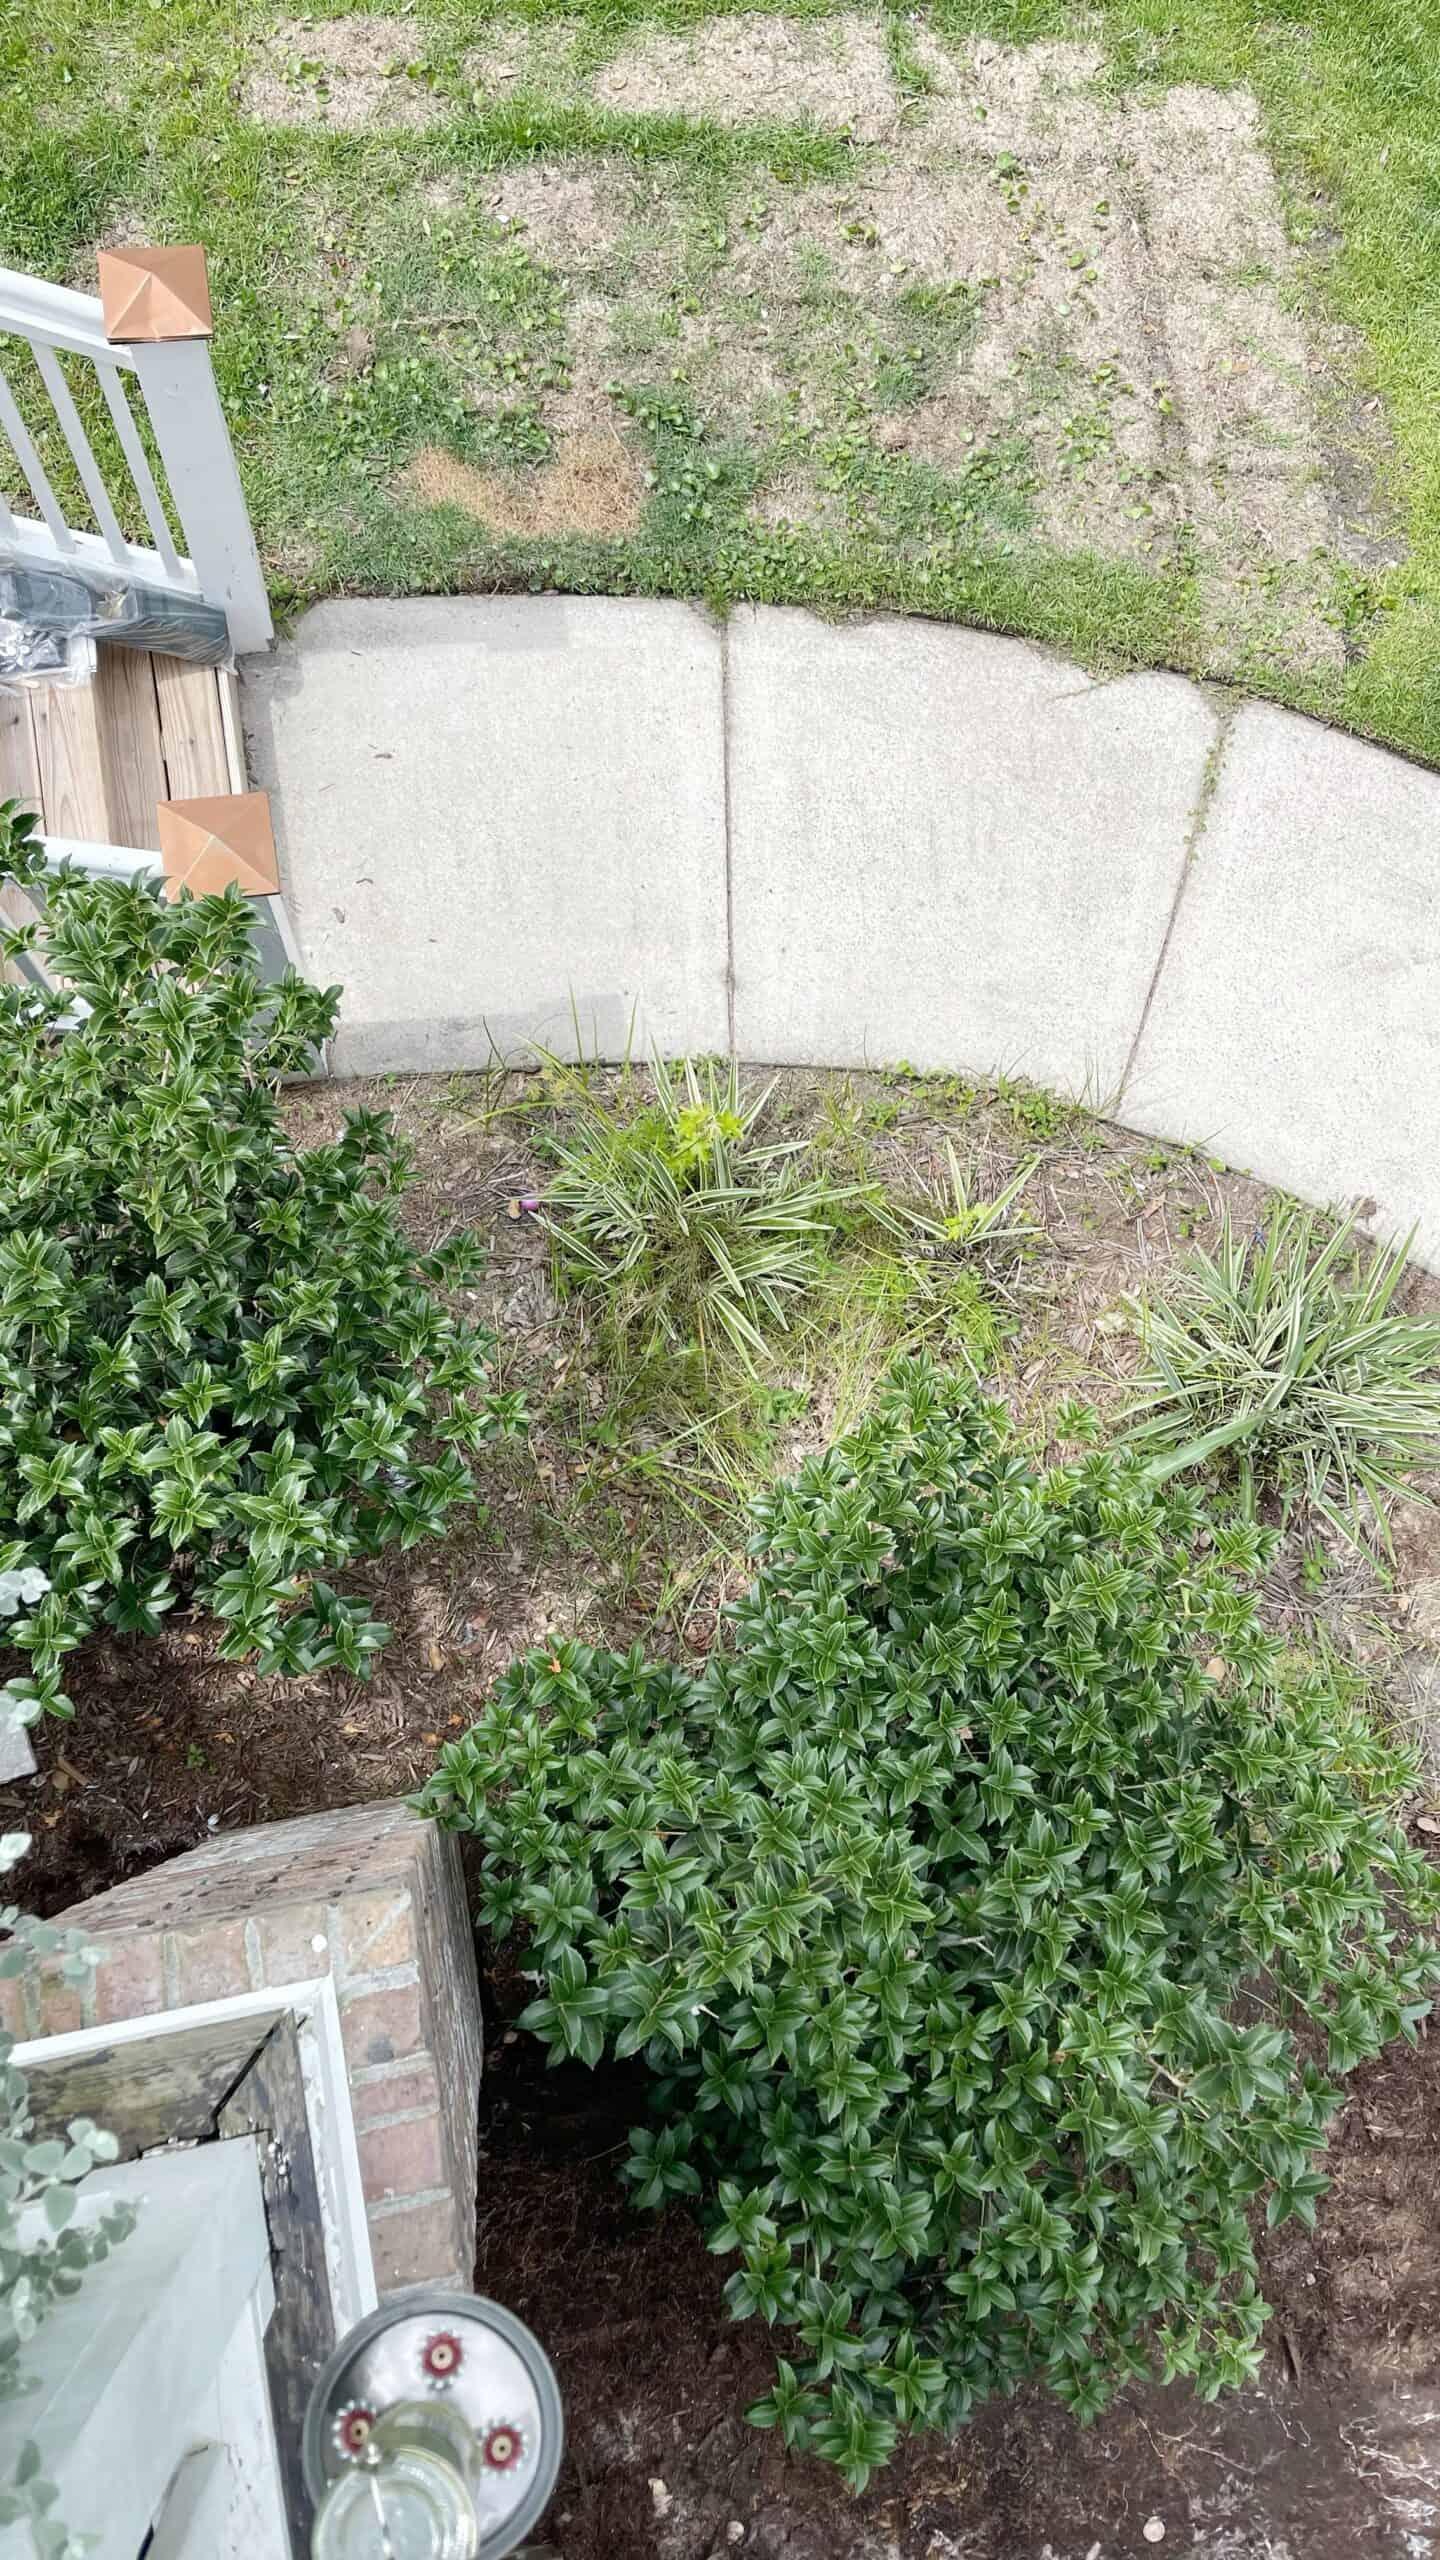 Backyard walkway with overgrown flowerbed and weeds.